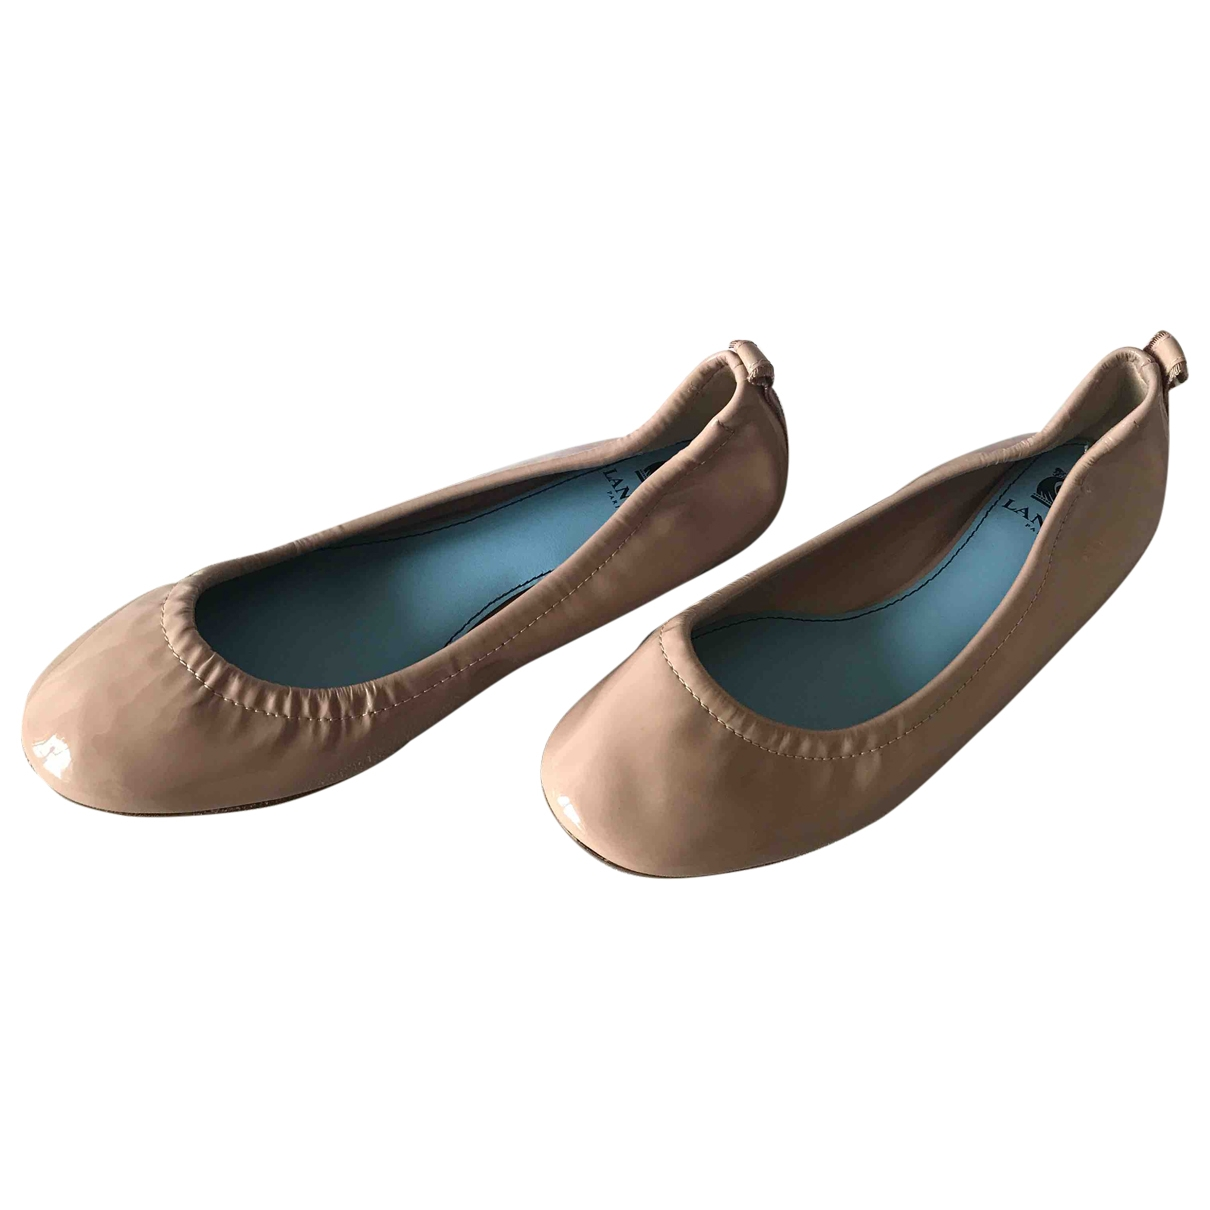 Lanvin \N Beige Patent leather Ballet flats for Women 37 EU